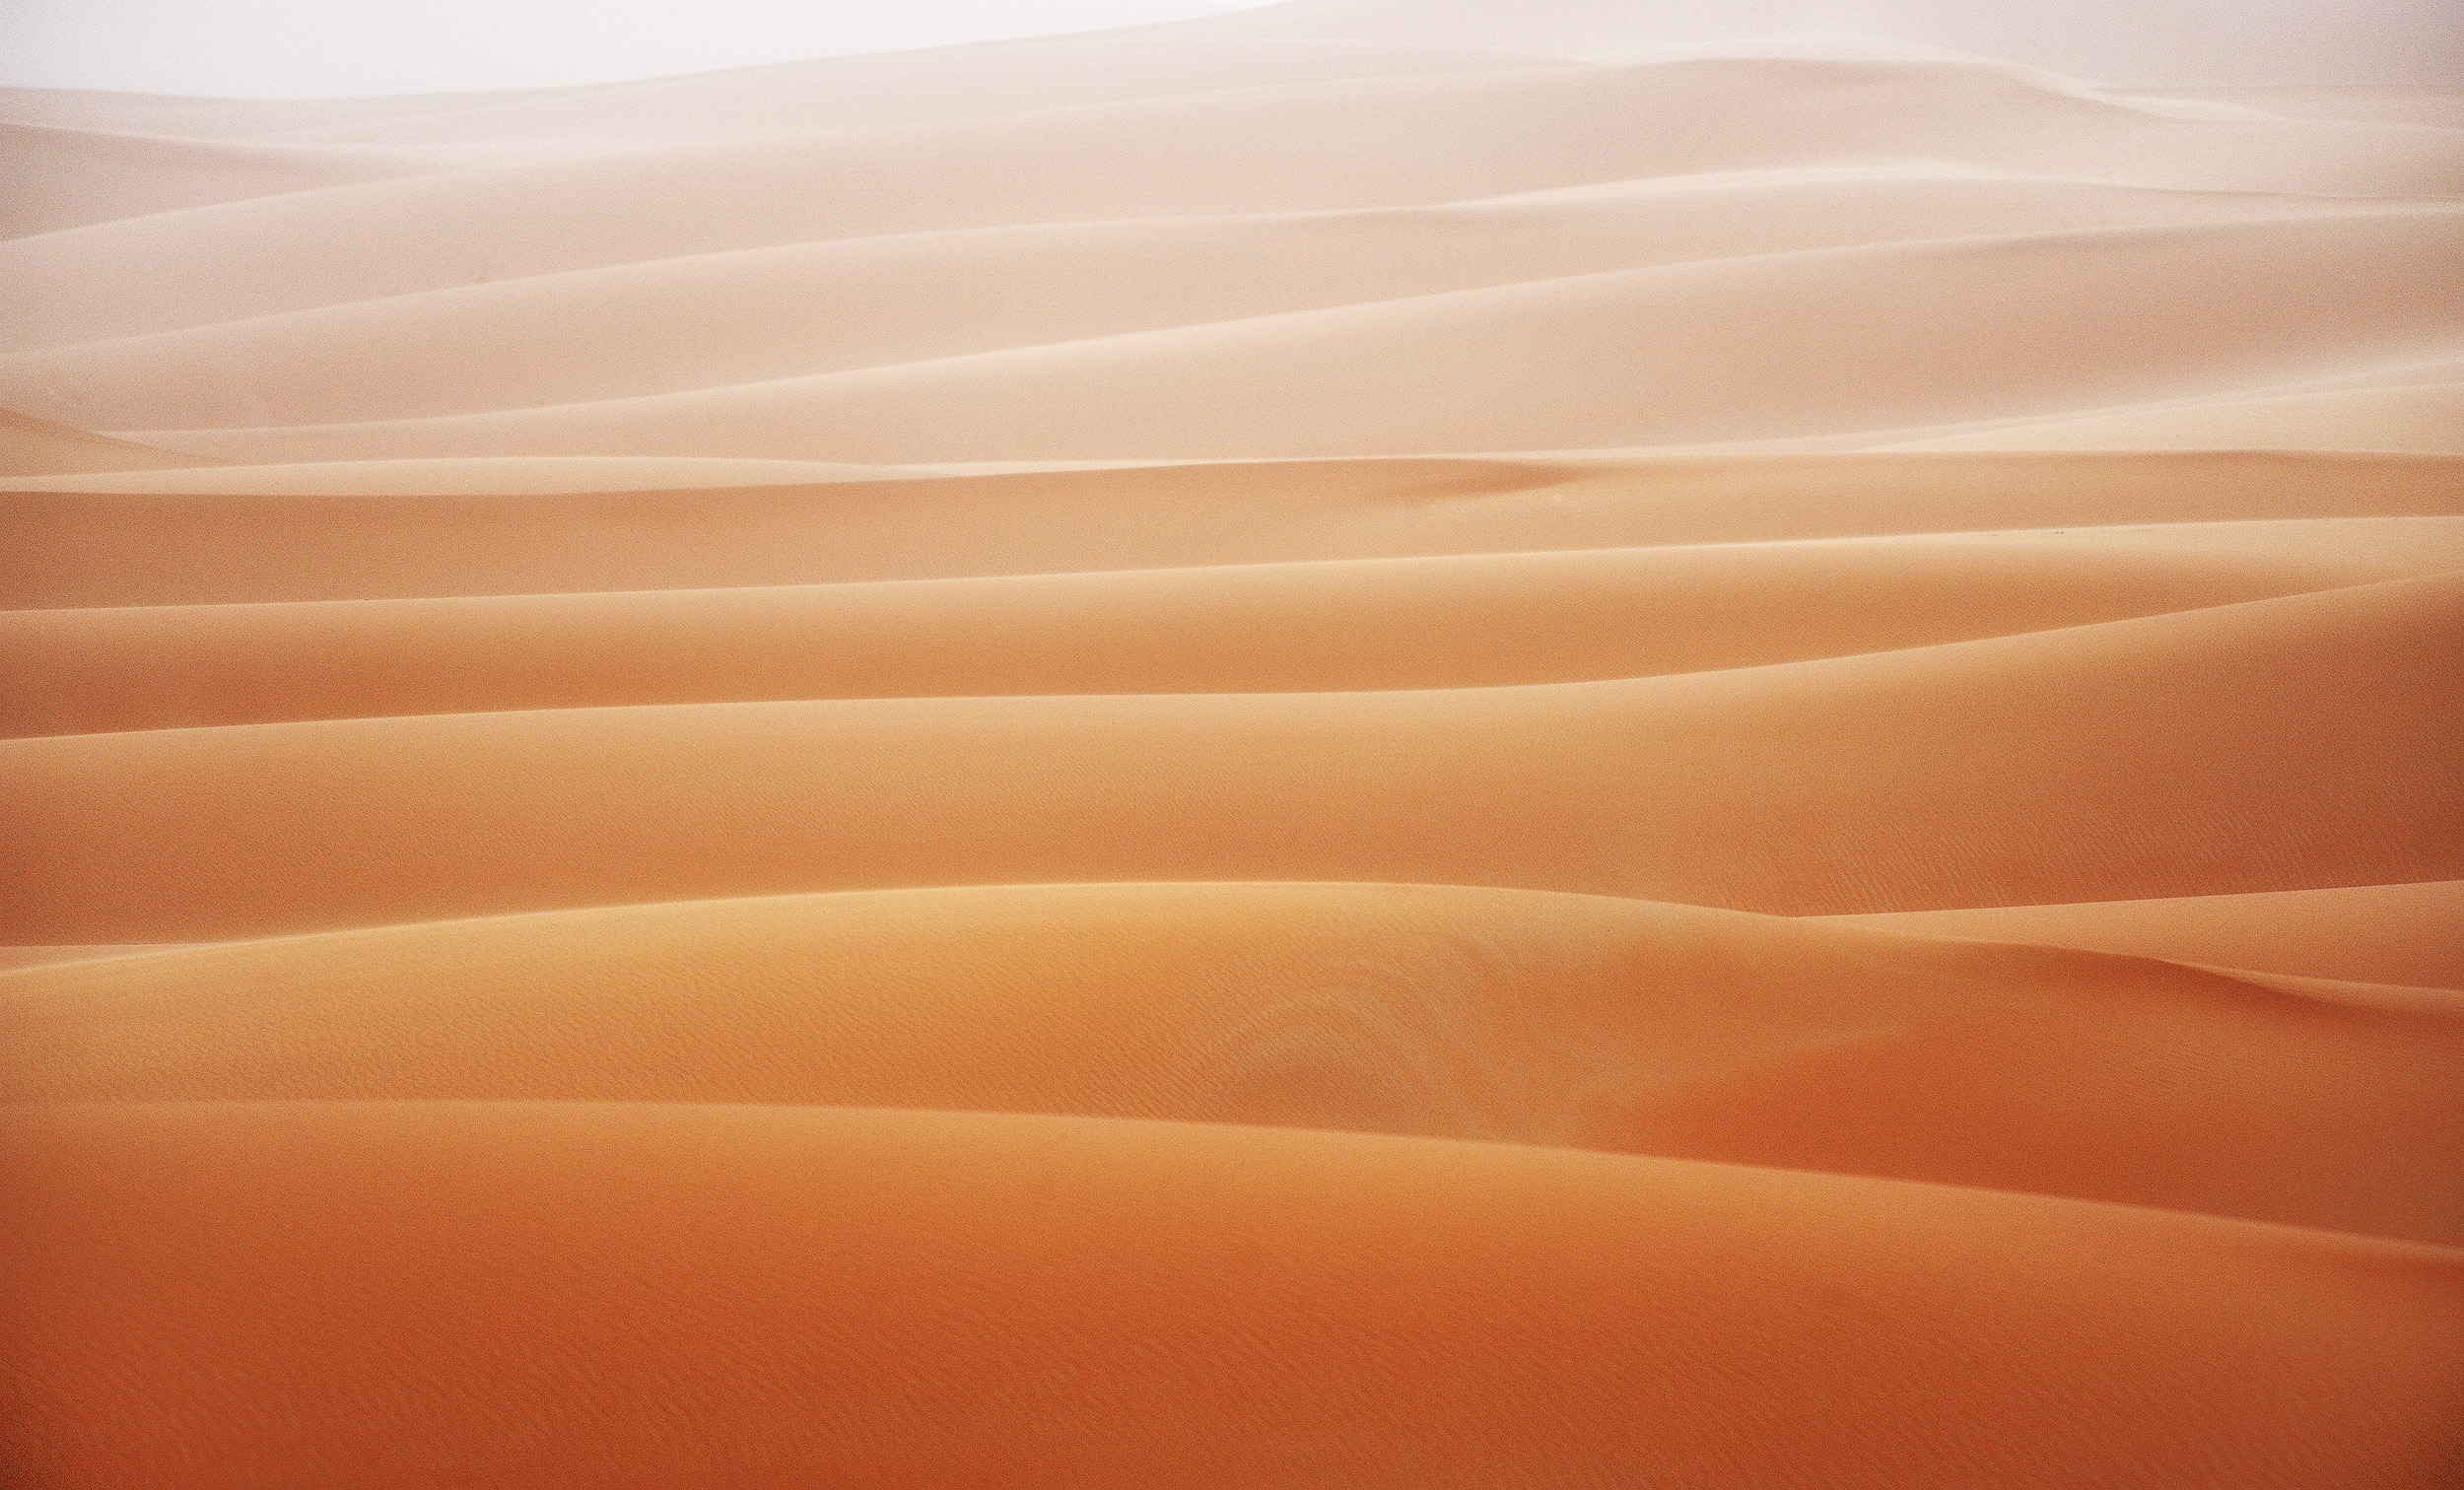 Morocco081 copy.jpg